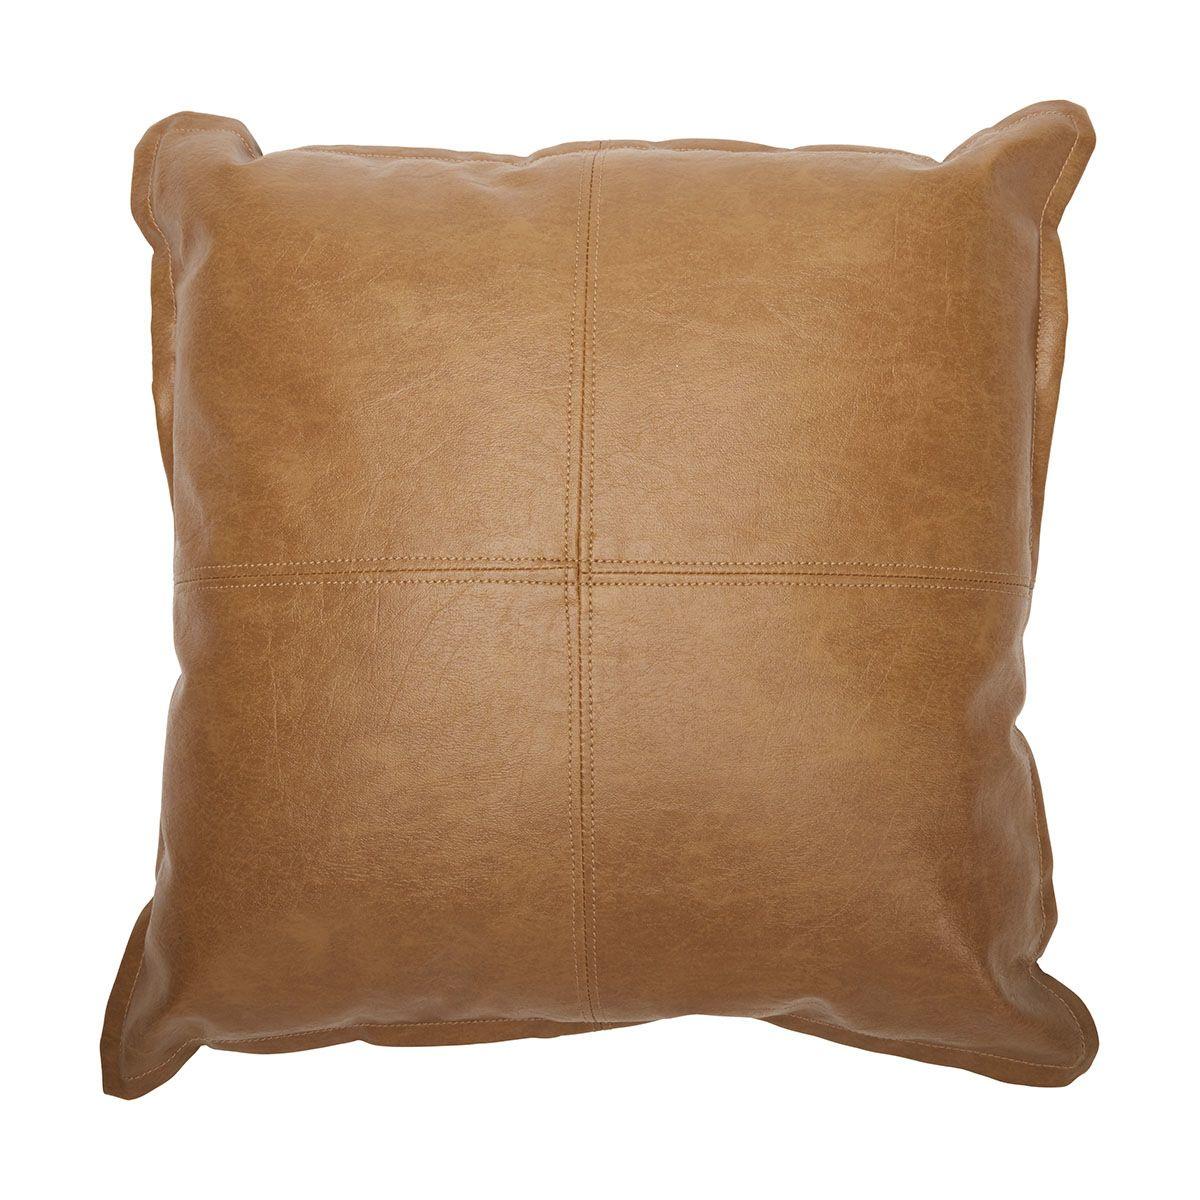 Harley Cushion Tan Kmart Kmart decor, Red pillows